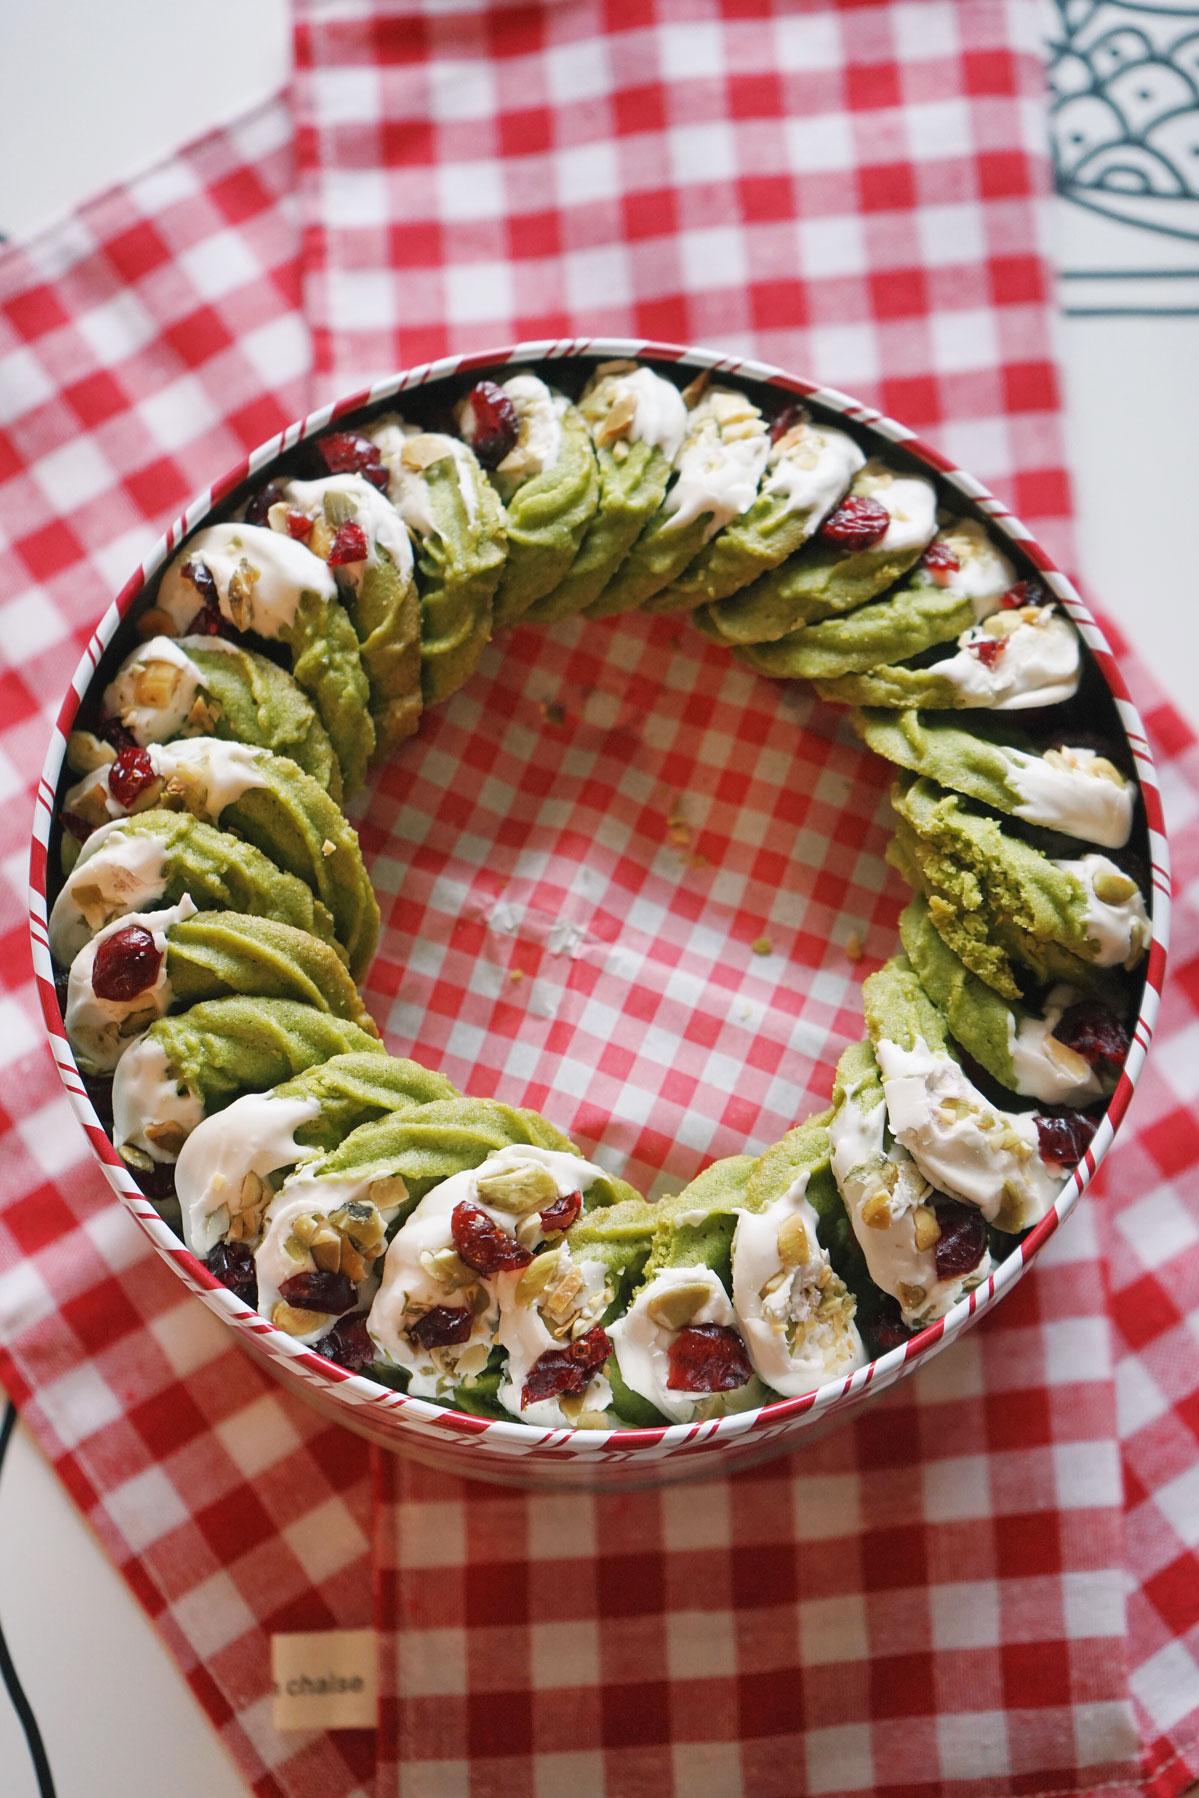 Herbakinglab-Matcha-Christmas-Wreath-Shortbread-old